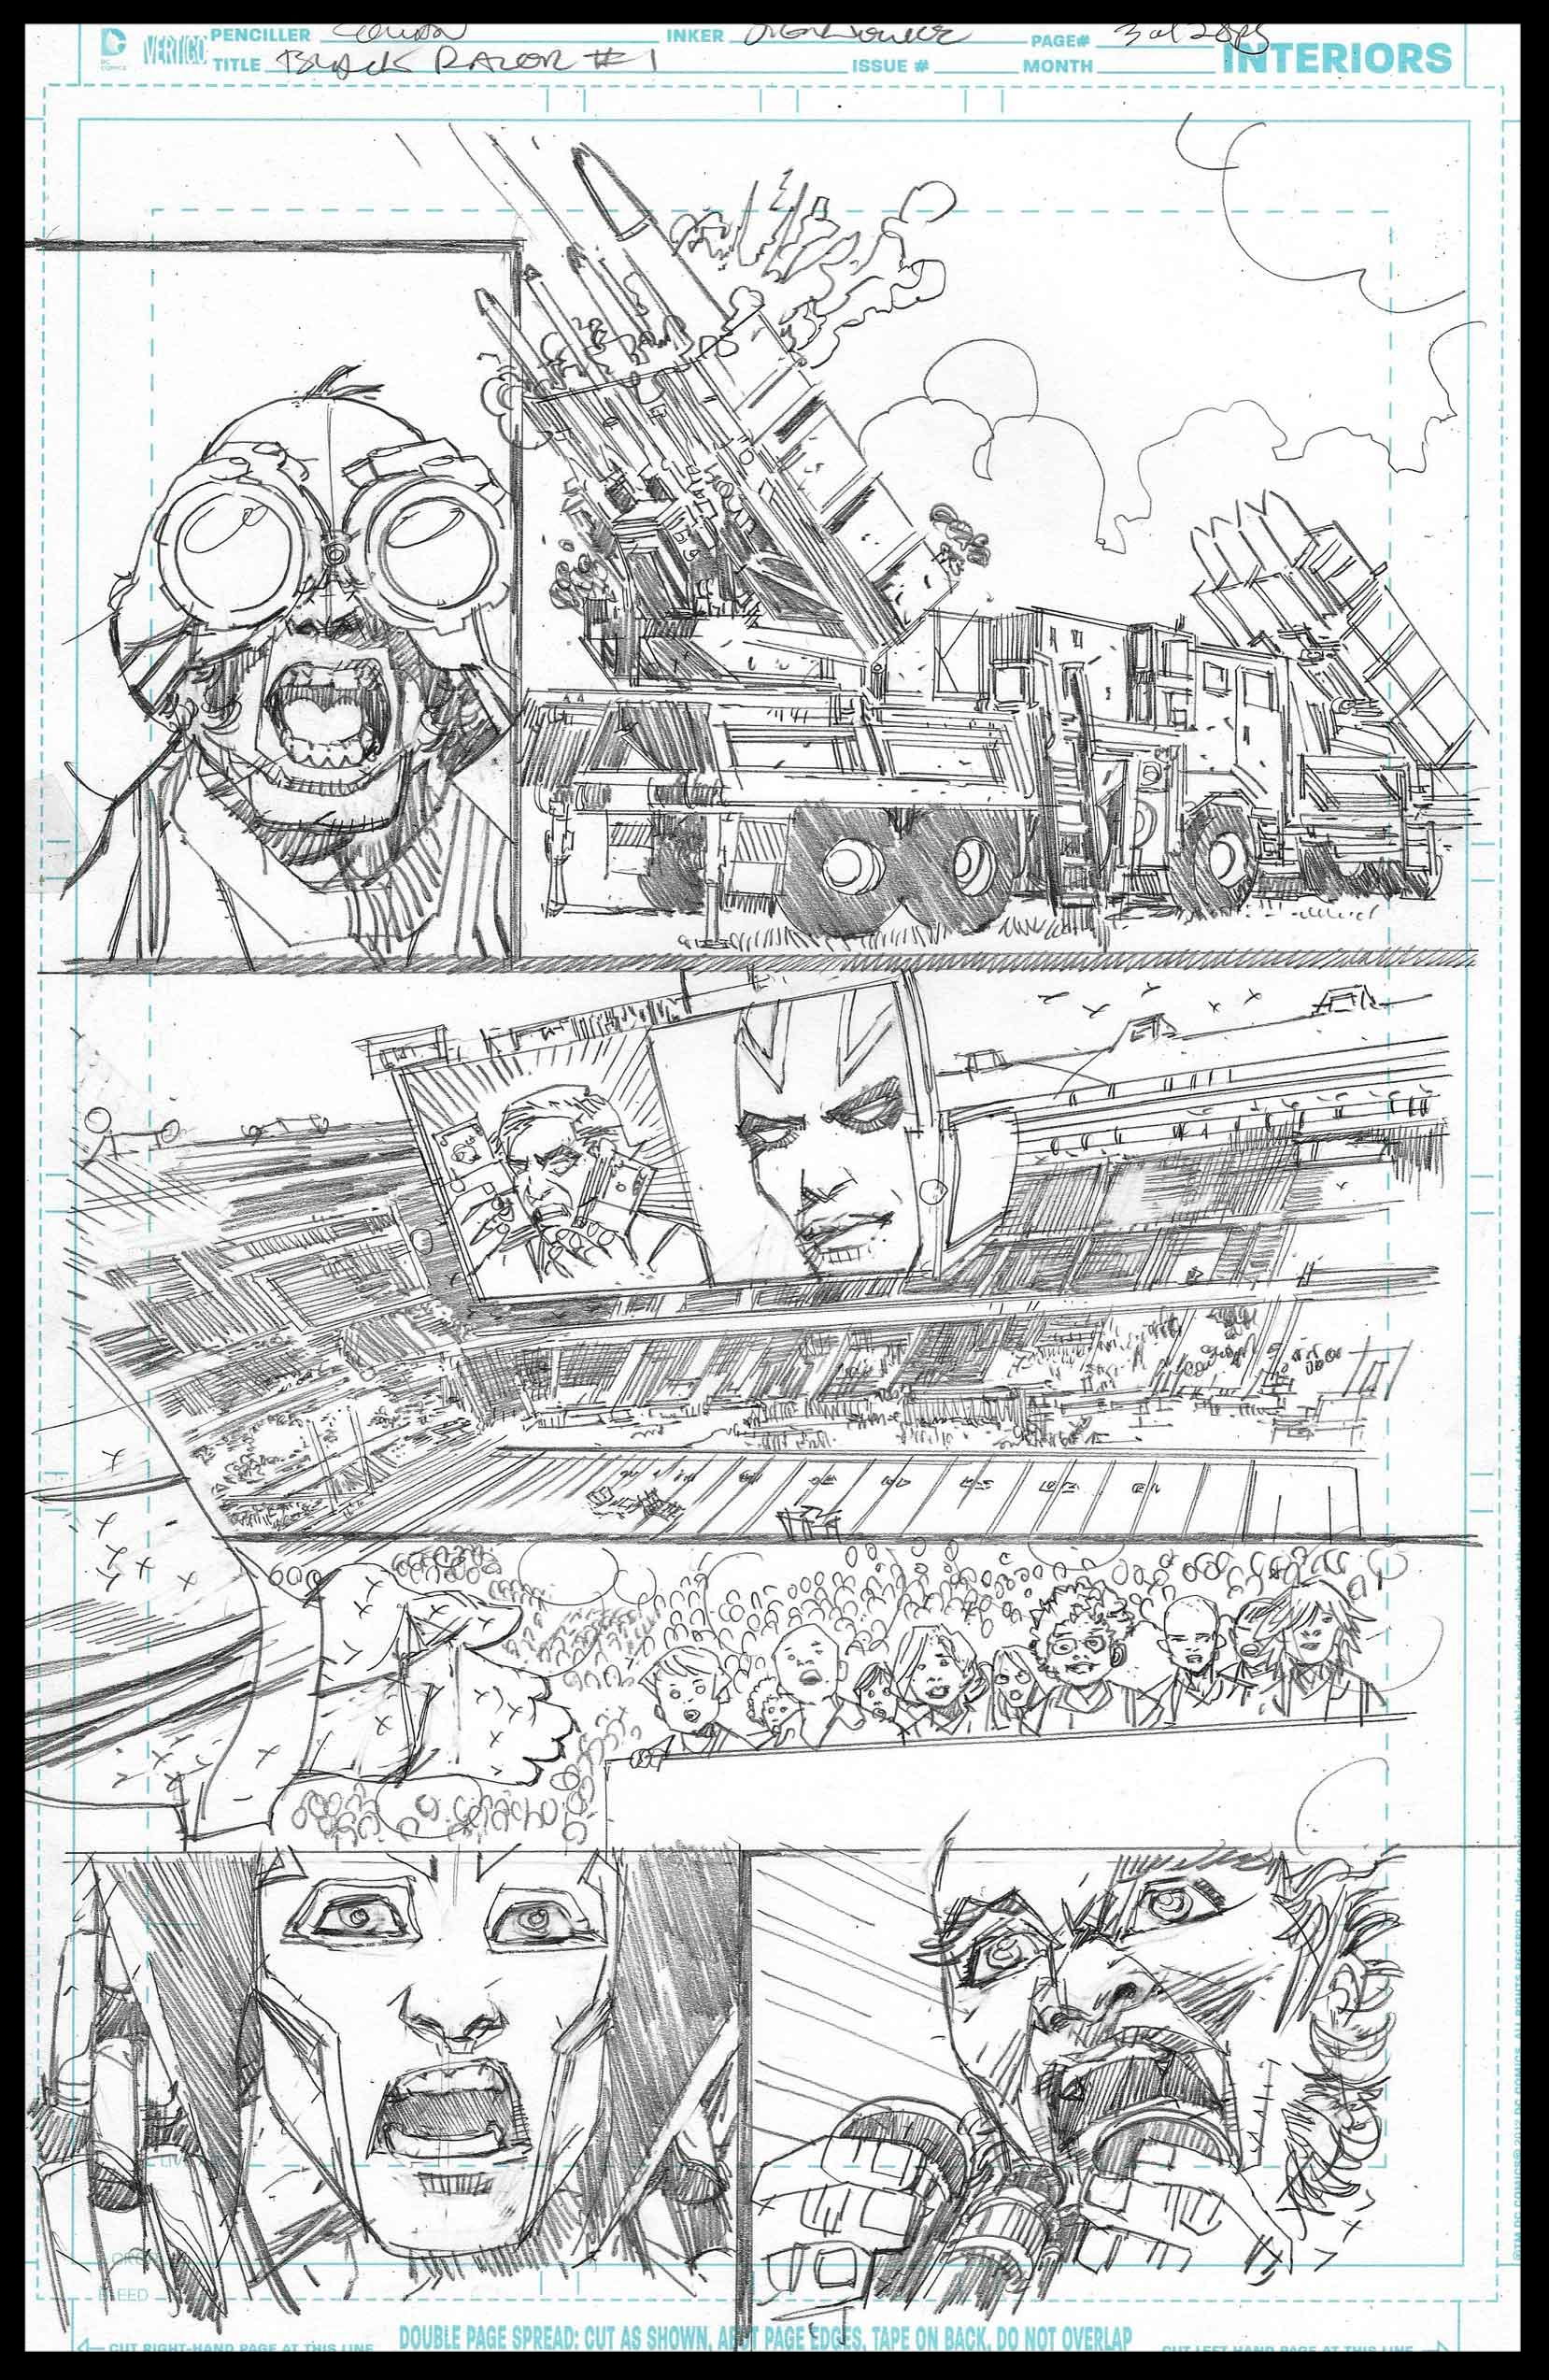 Black Racer #1 - Page 3 - Pencils